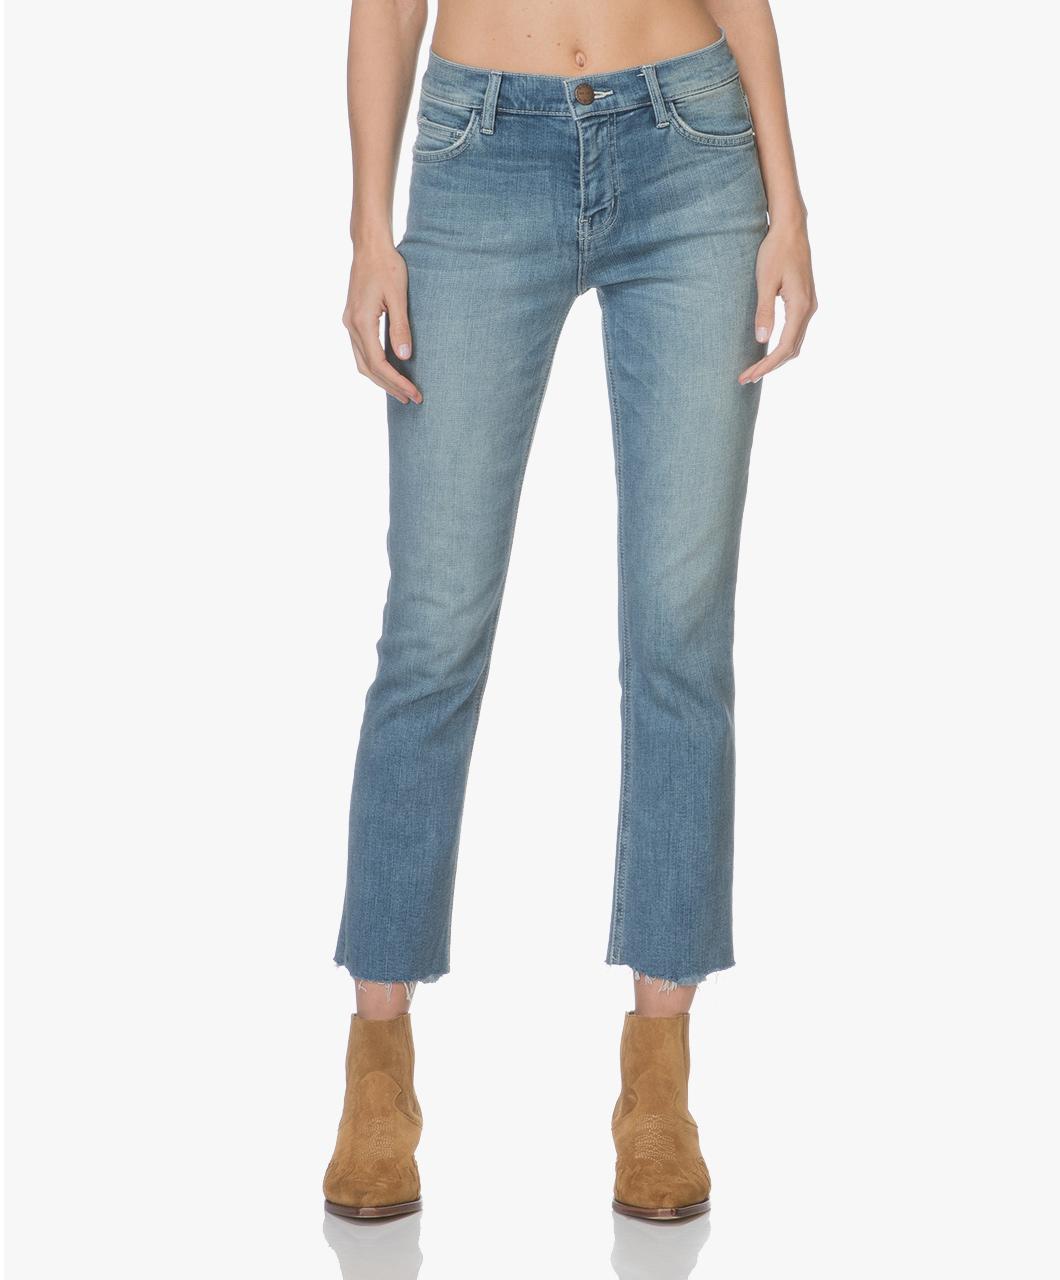 Afbeelding van Current/Elliot Jeans Joey Medium The High Waist Straight